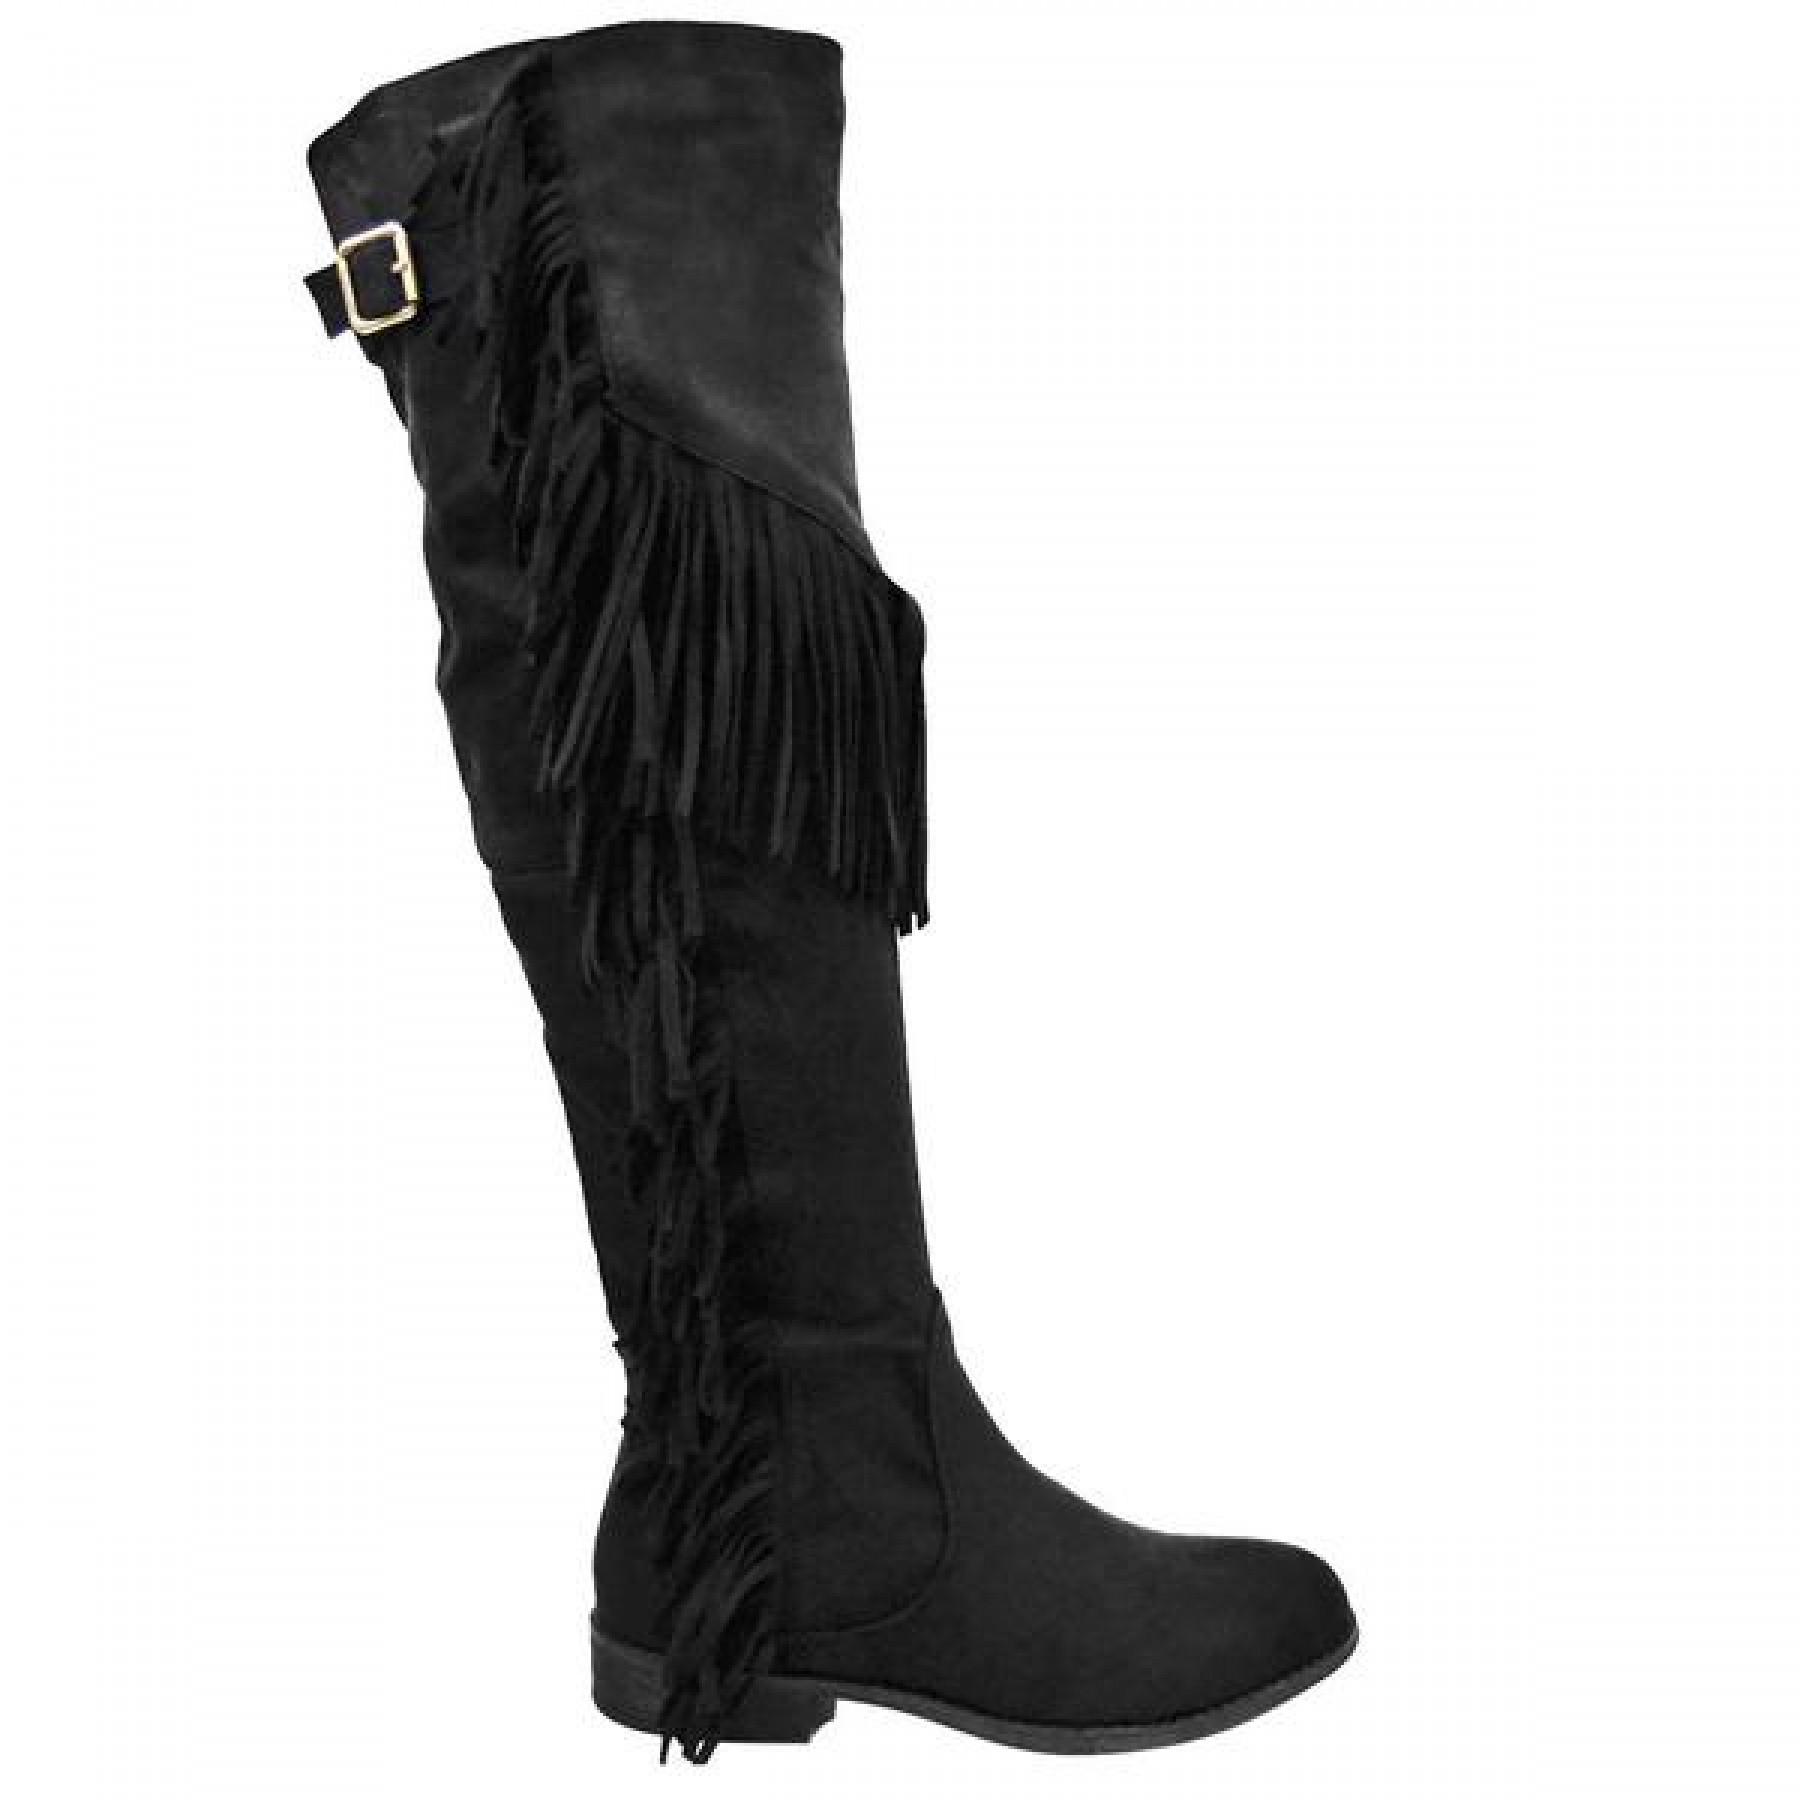 Women's Black Oksana-65 Knee-High Boot with Fringed Sides